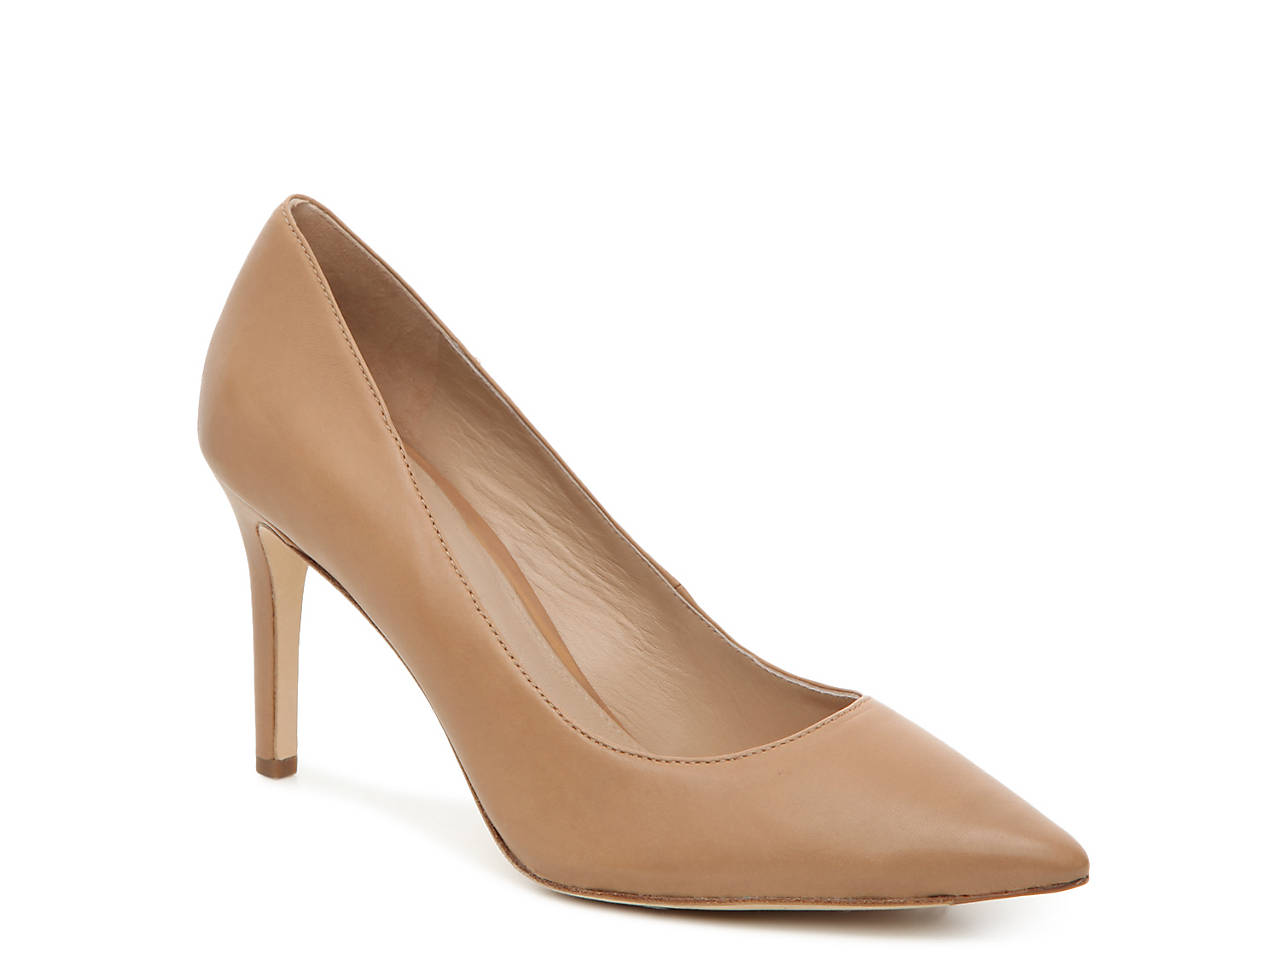 bb8f226ceb0 Via Spiga Carola Leather Pump Women s Shoes